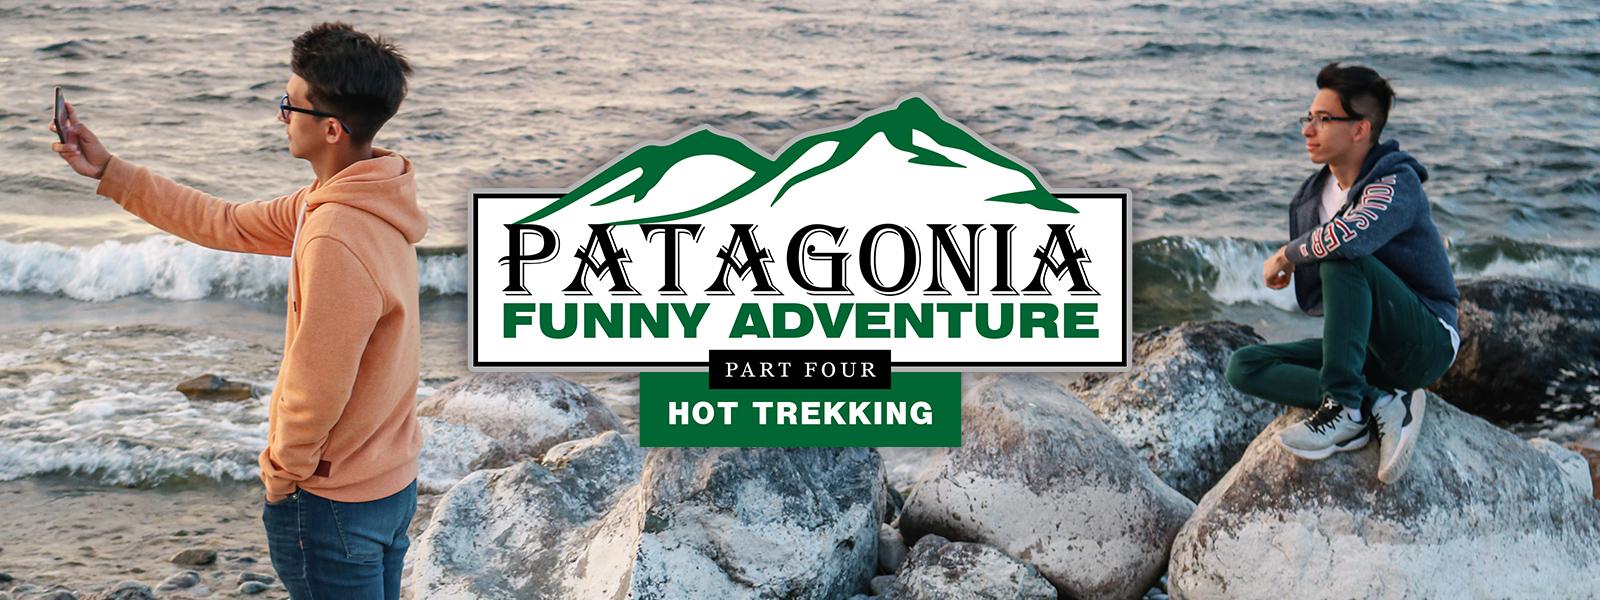 Patagonia Funny Adventure | Part 4: Hot Trekking